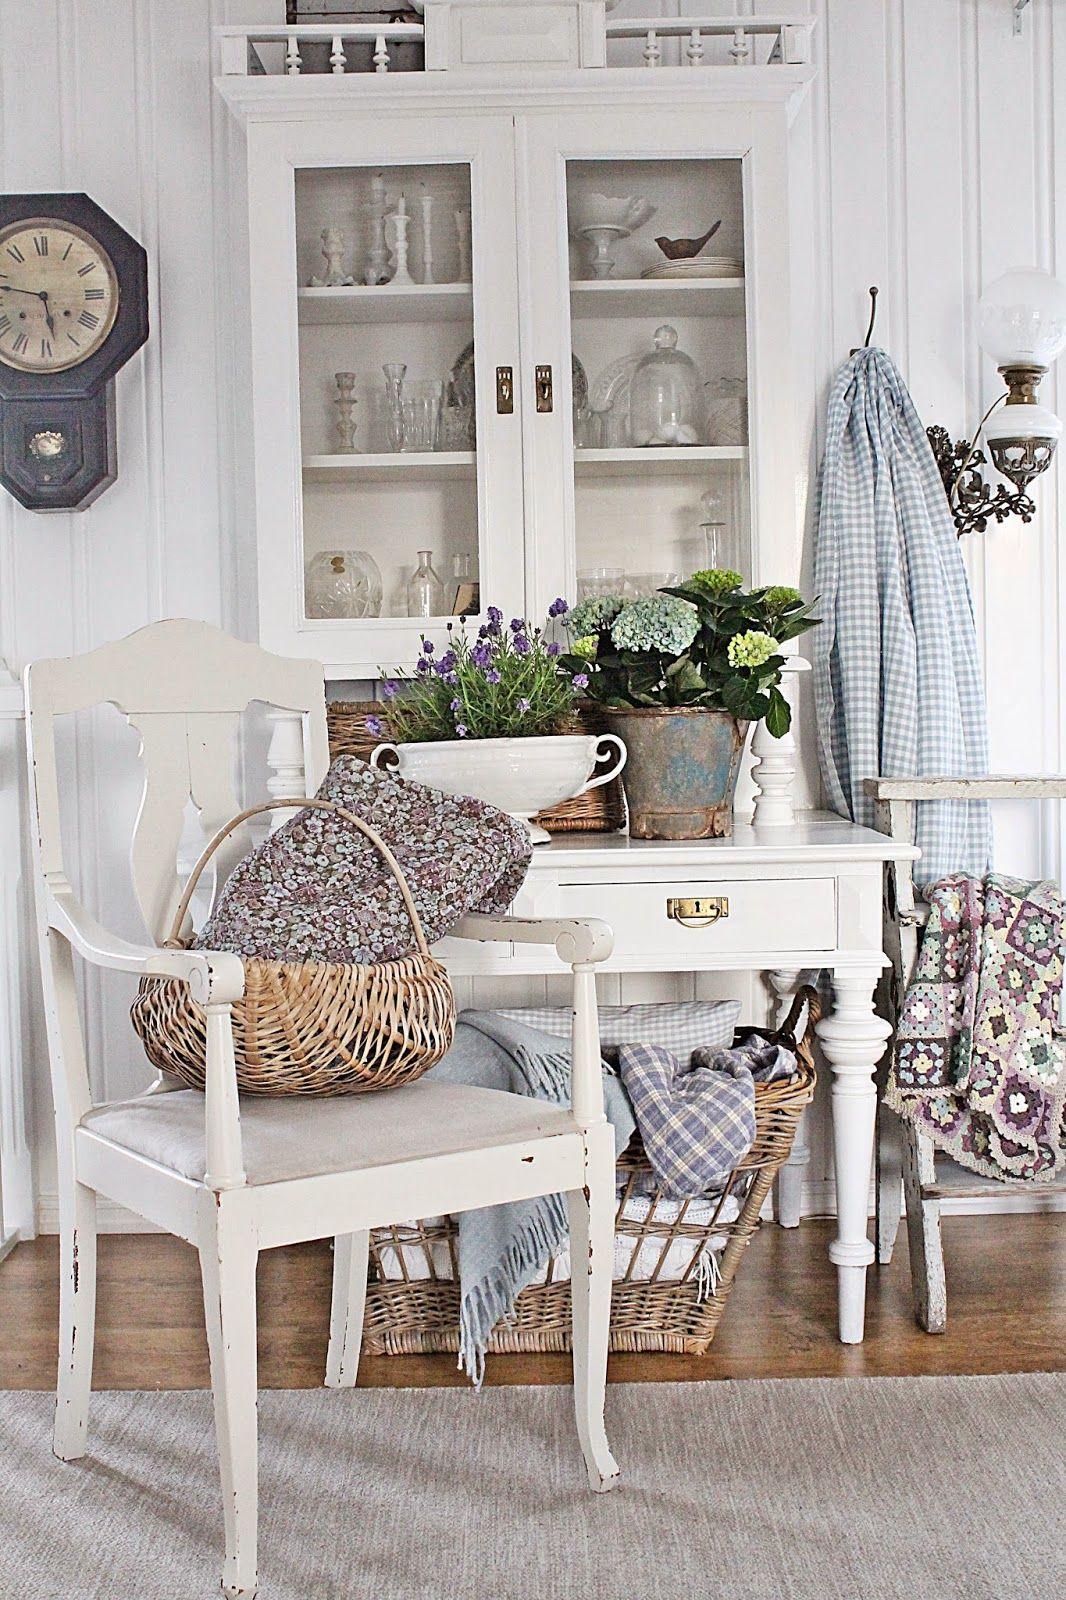 Vibeke design azul pinterest reciclar para decorar dulce hogar y decoraciones del hogar - Pinterest decoracion hogar ...